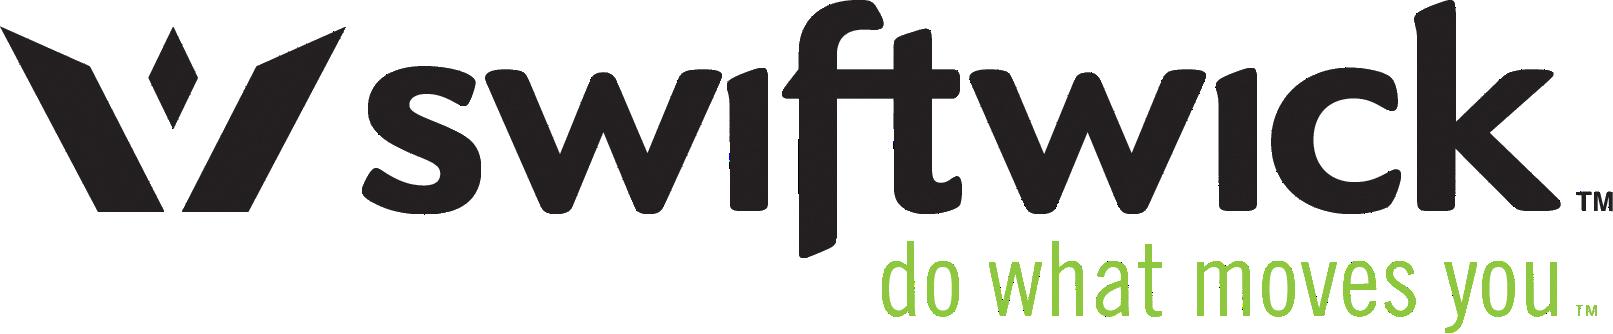 Swiftwick Logo.png